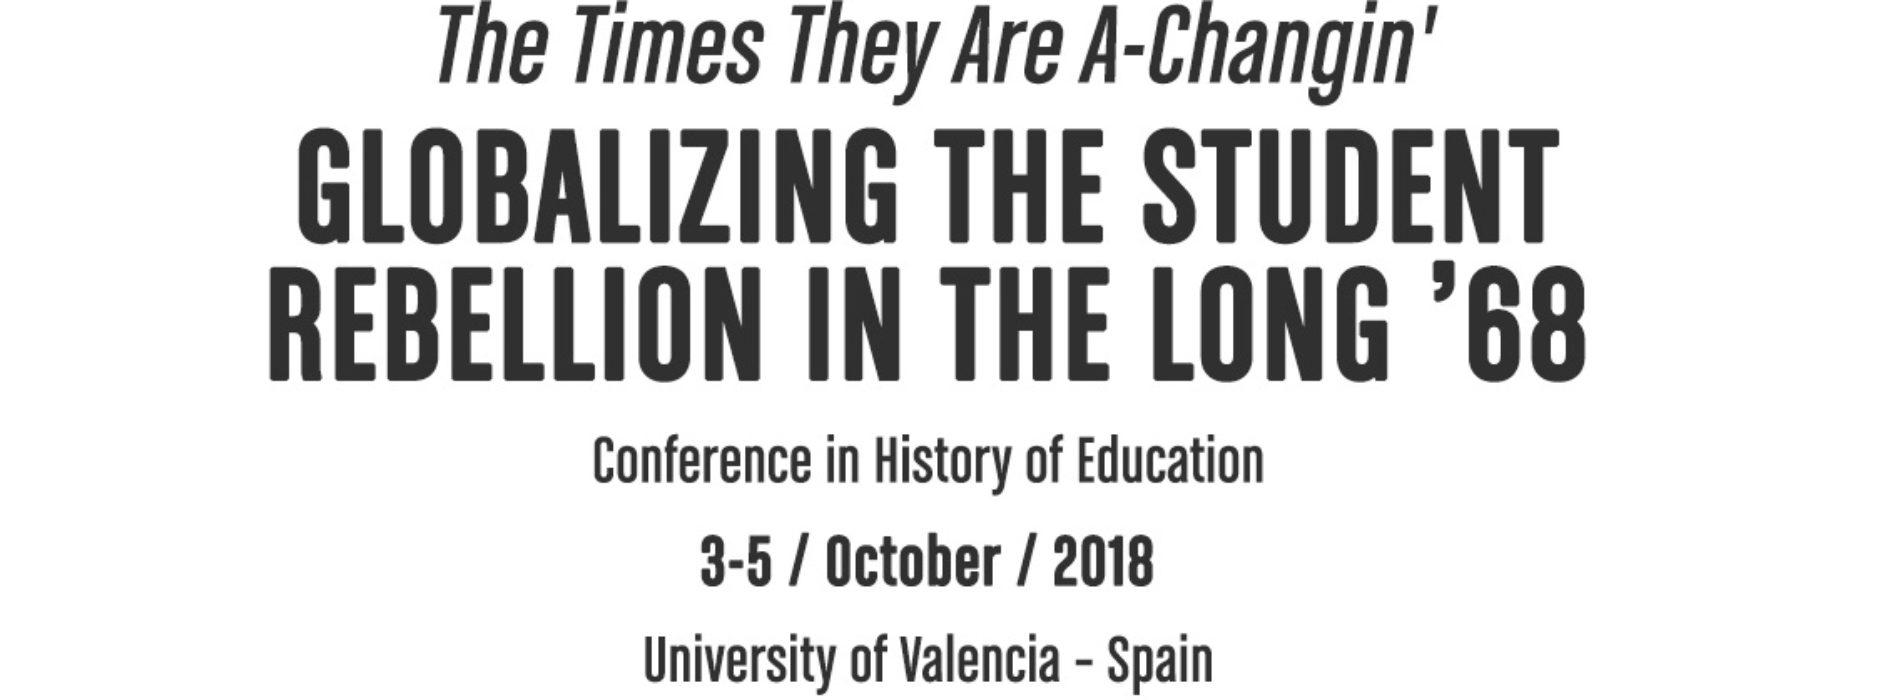 CFP: Globalizing the student rebellion in the long '68. Deadline Apr. 4 2018